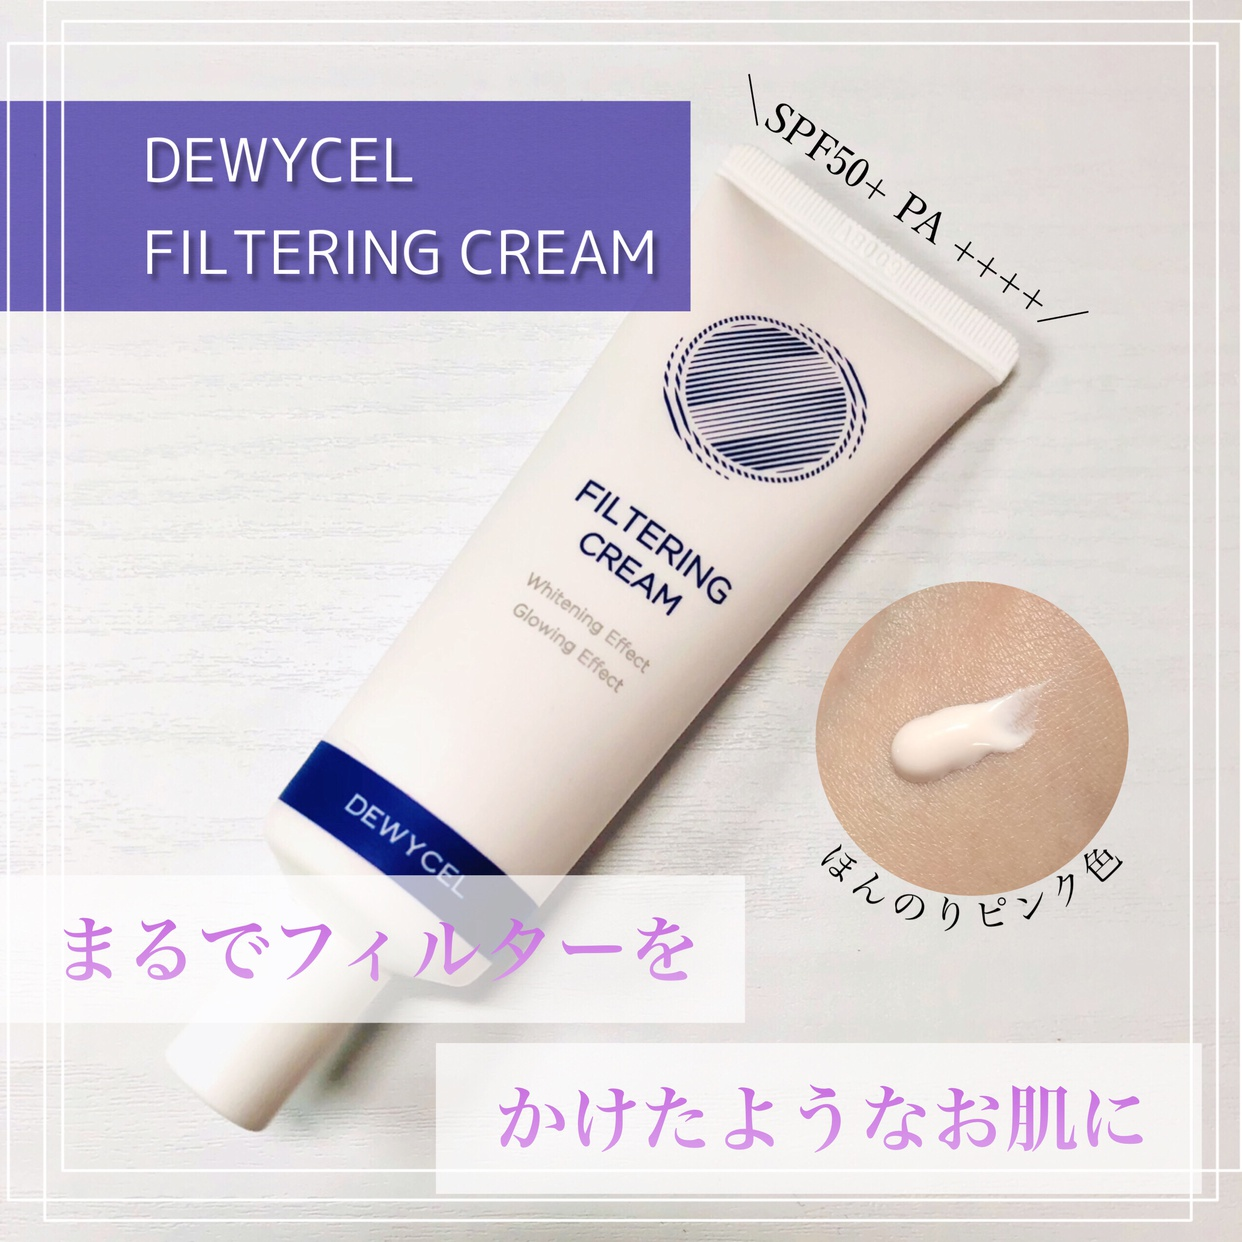 DEWYCEL(デュイセル) フィルタリングクリームを使ったsachikoさんのクチコミ画像1